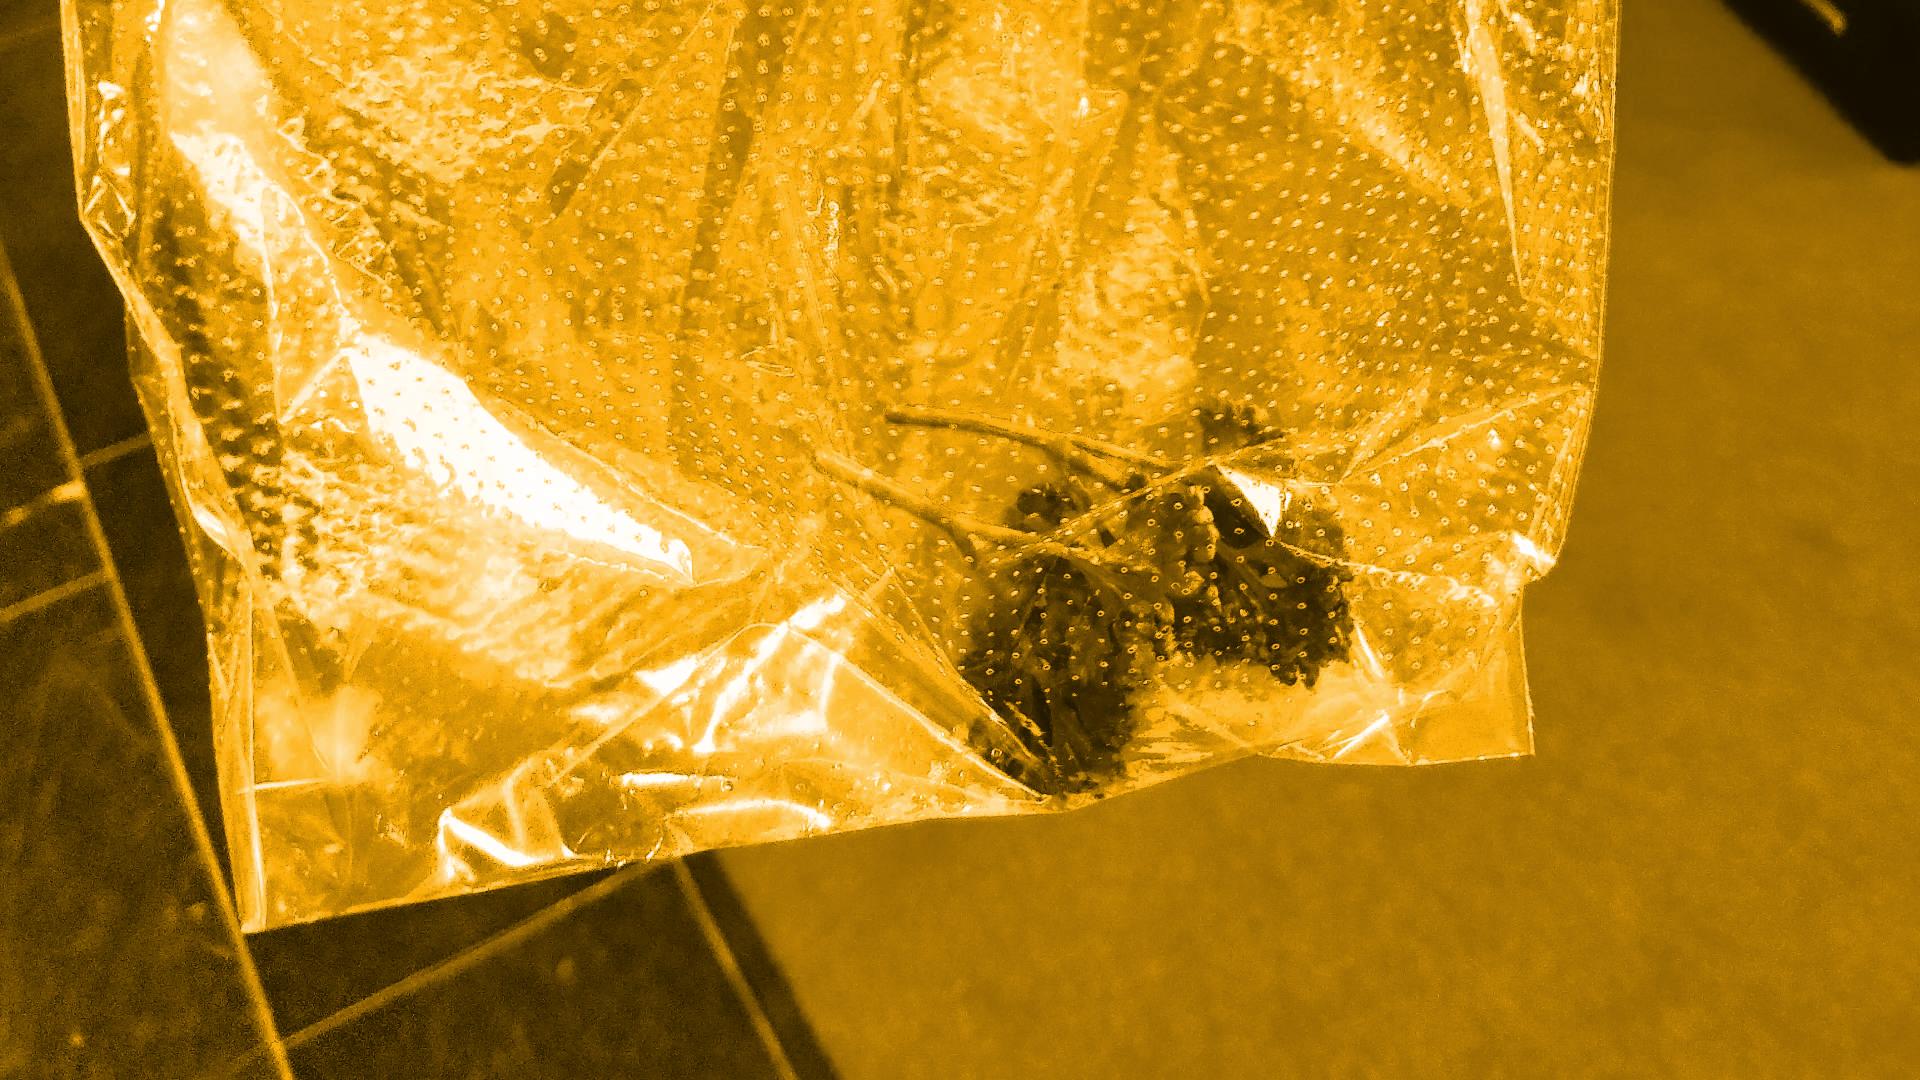 Unboxing Glasbox: Fick die Scheiß Petersilie